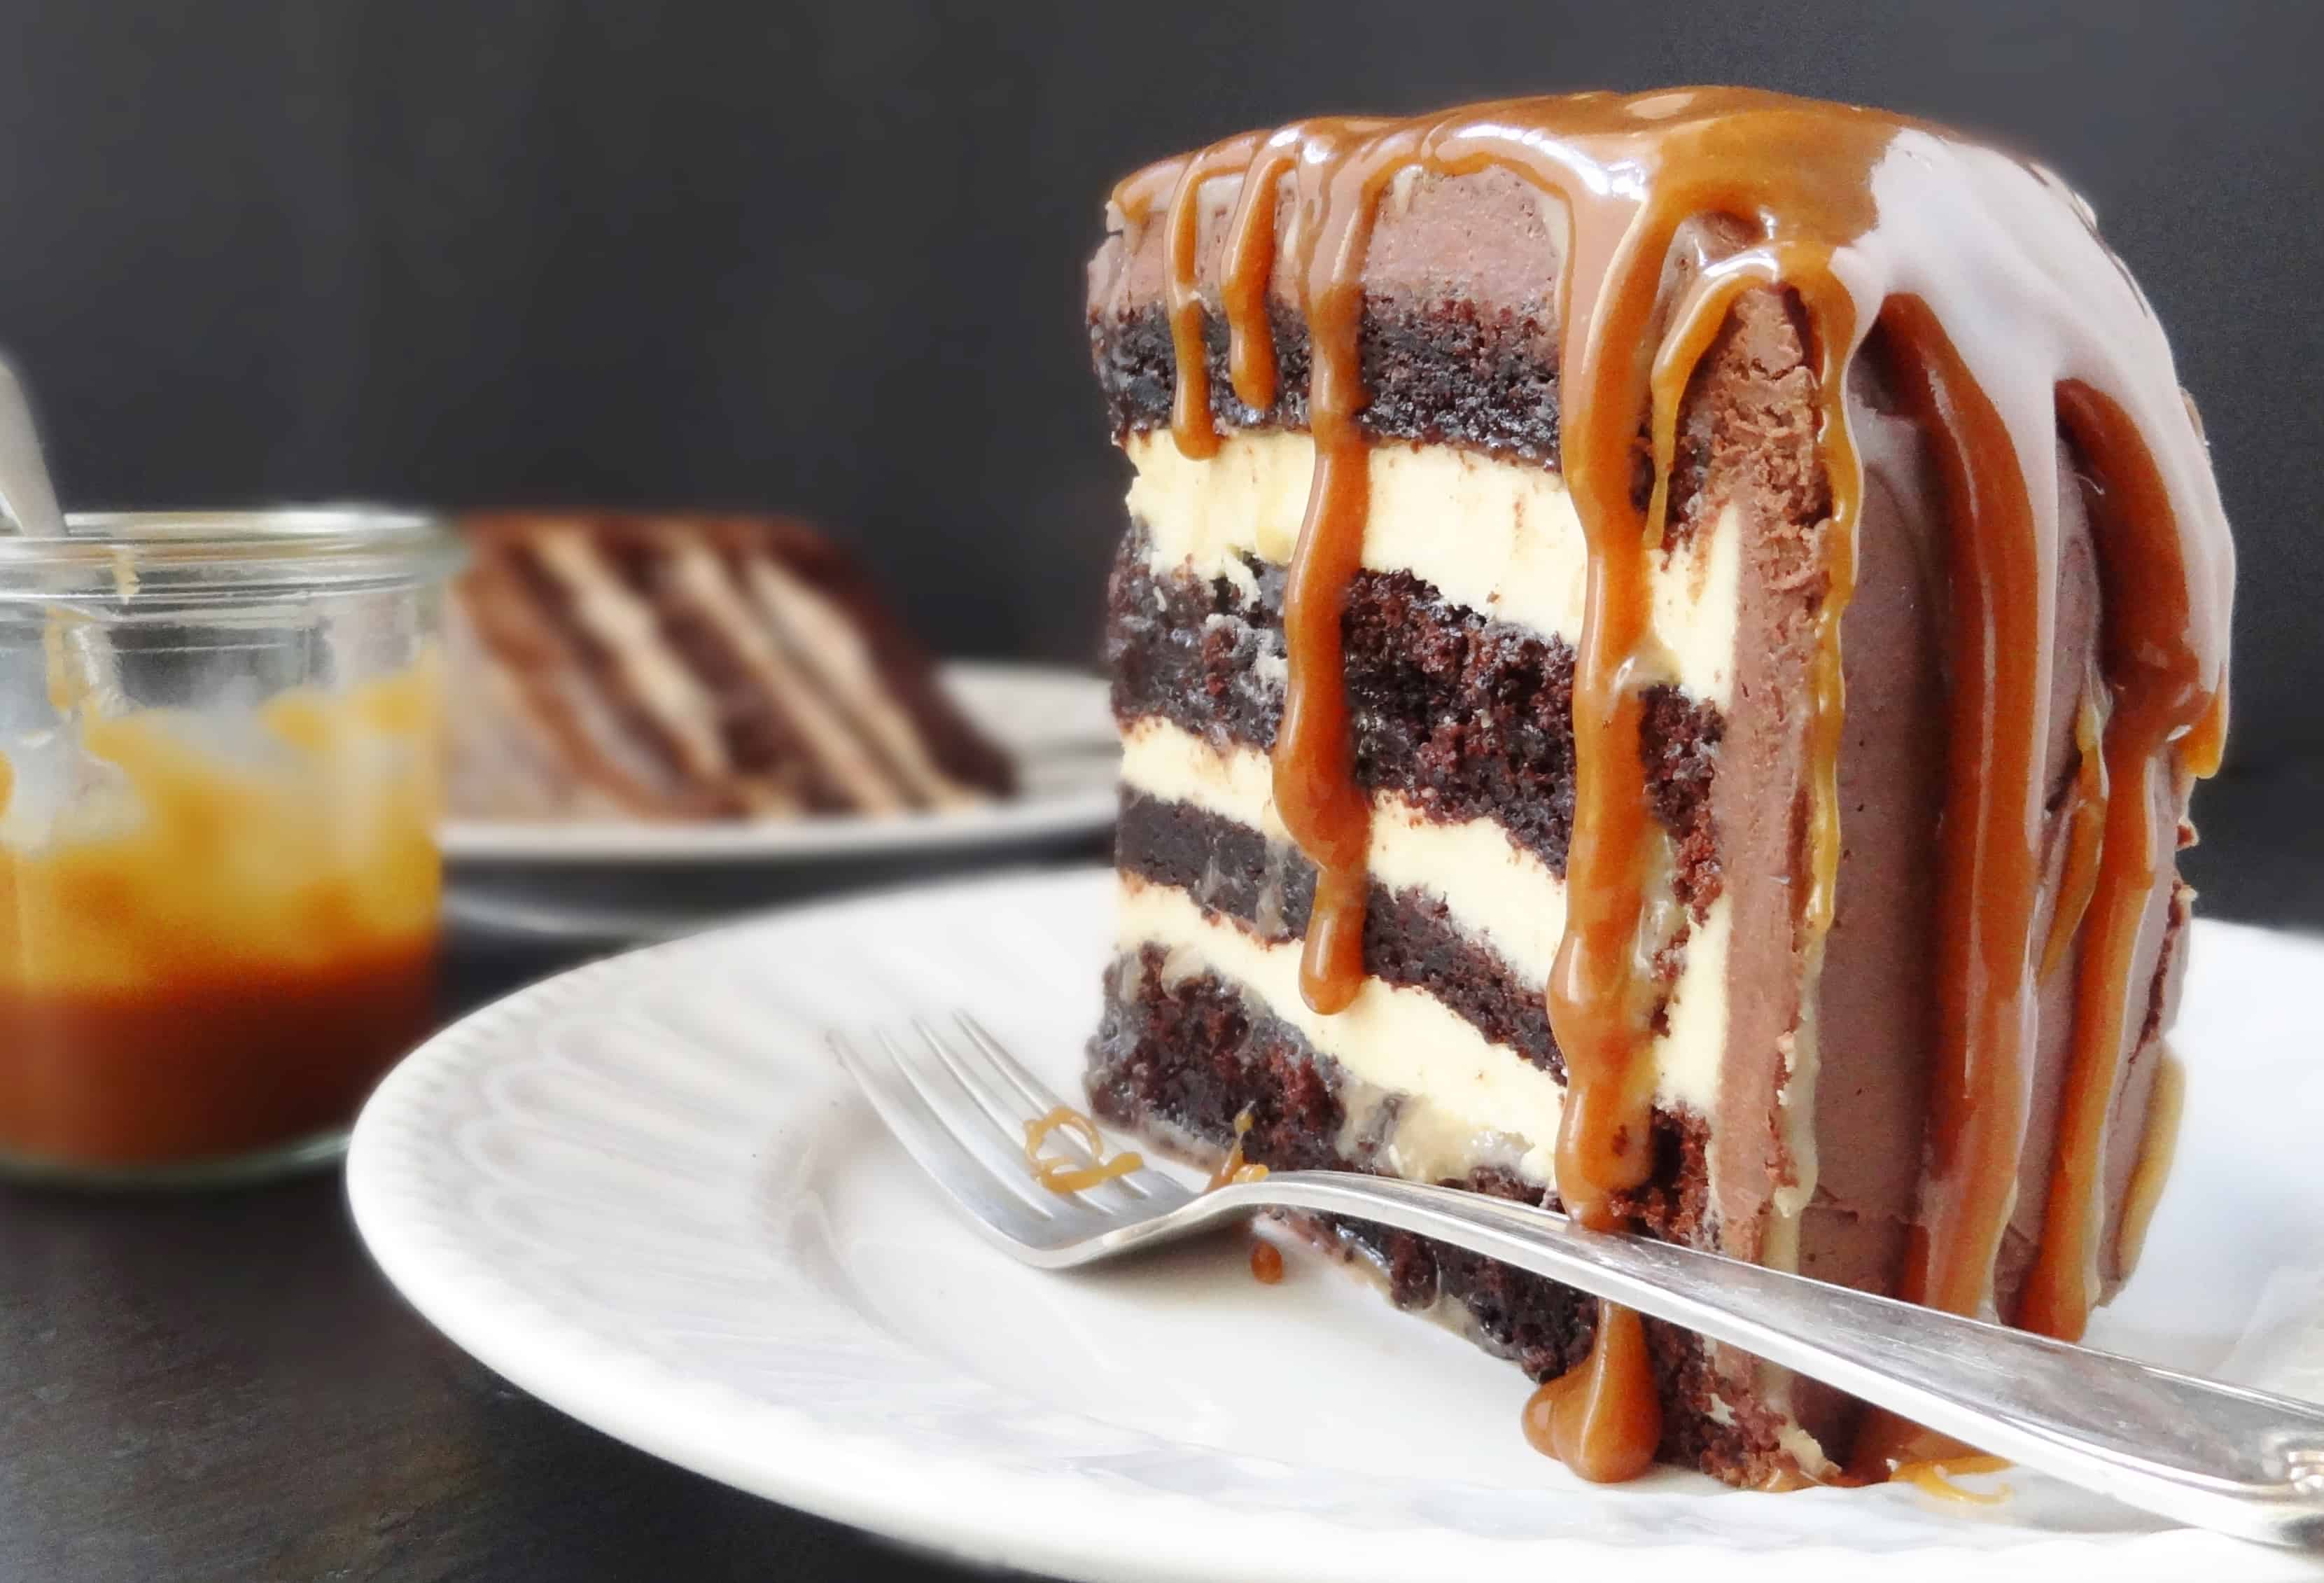 Fudge Icing For Carmel Chocolate Cake